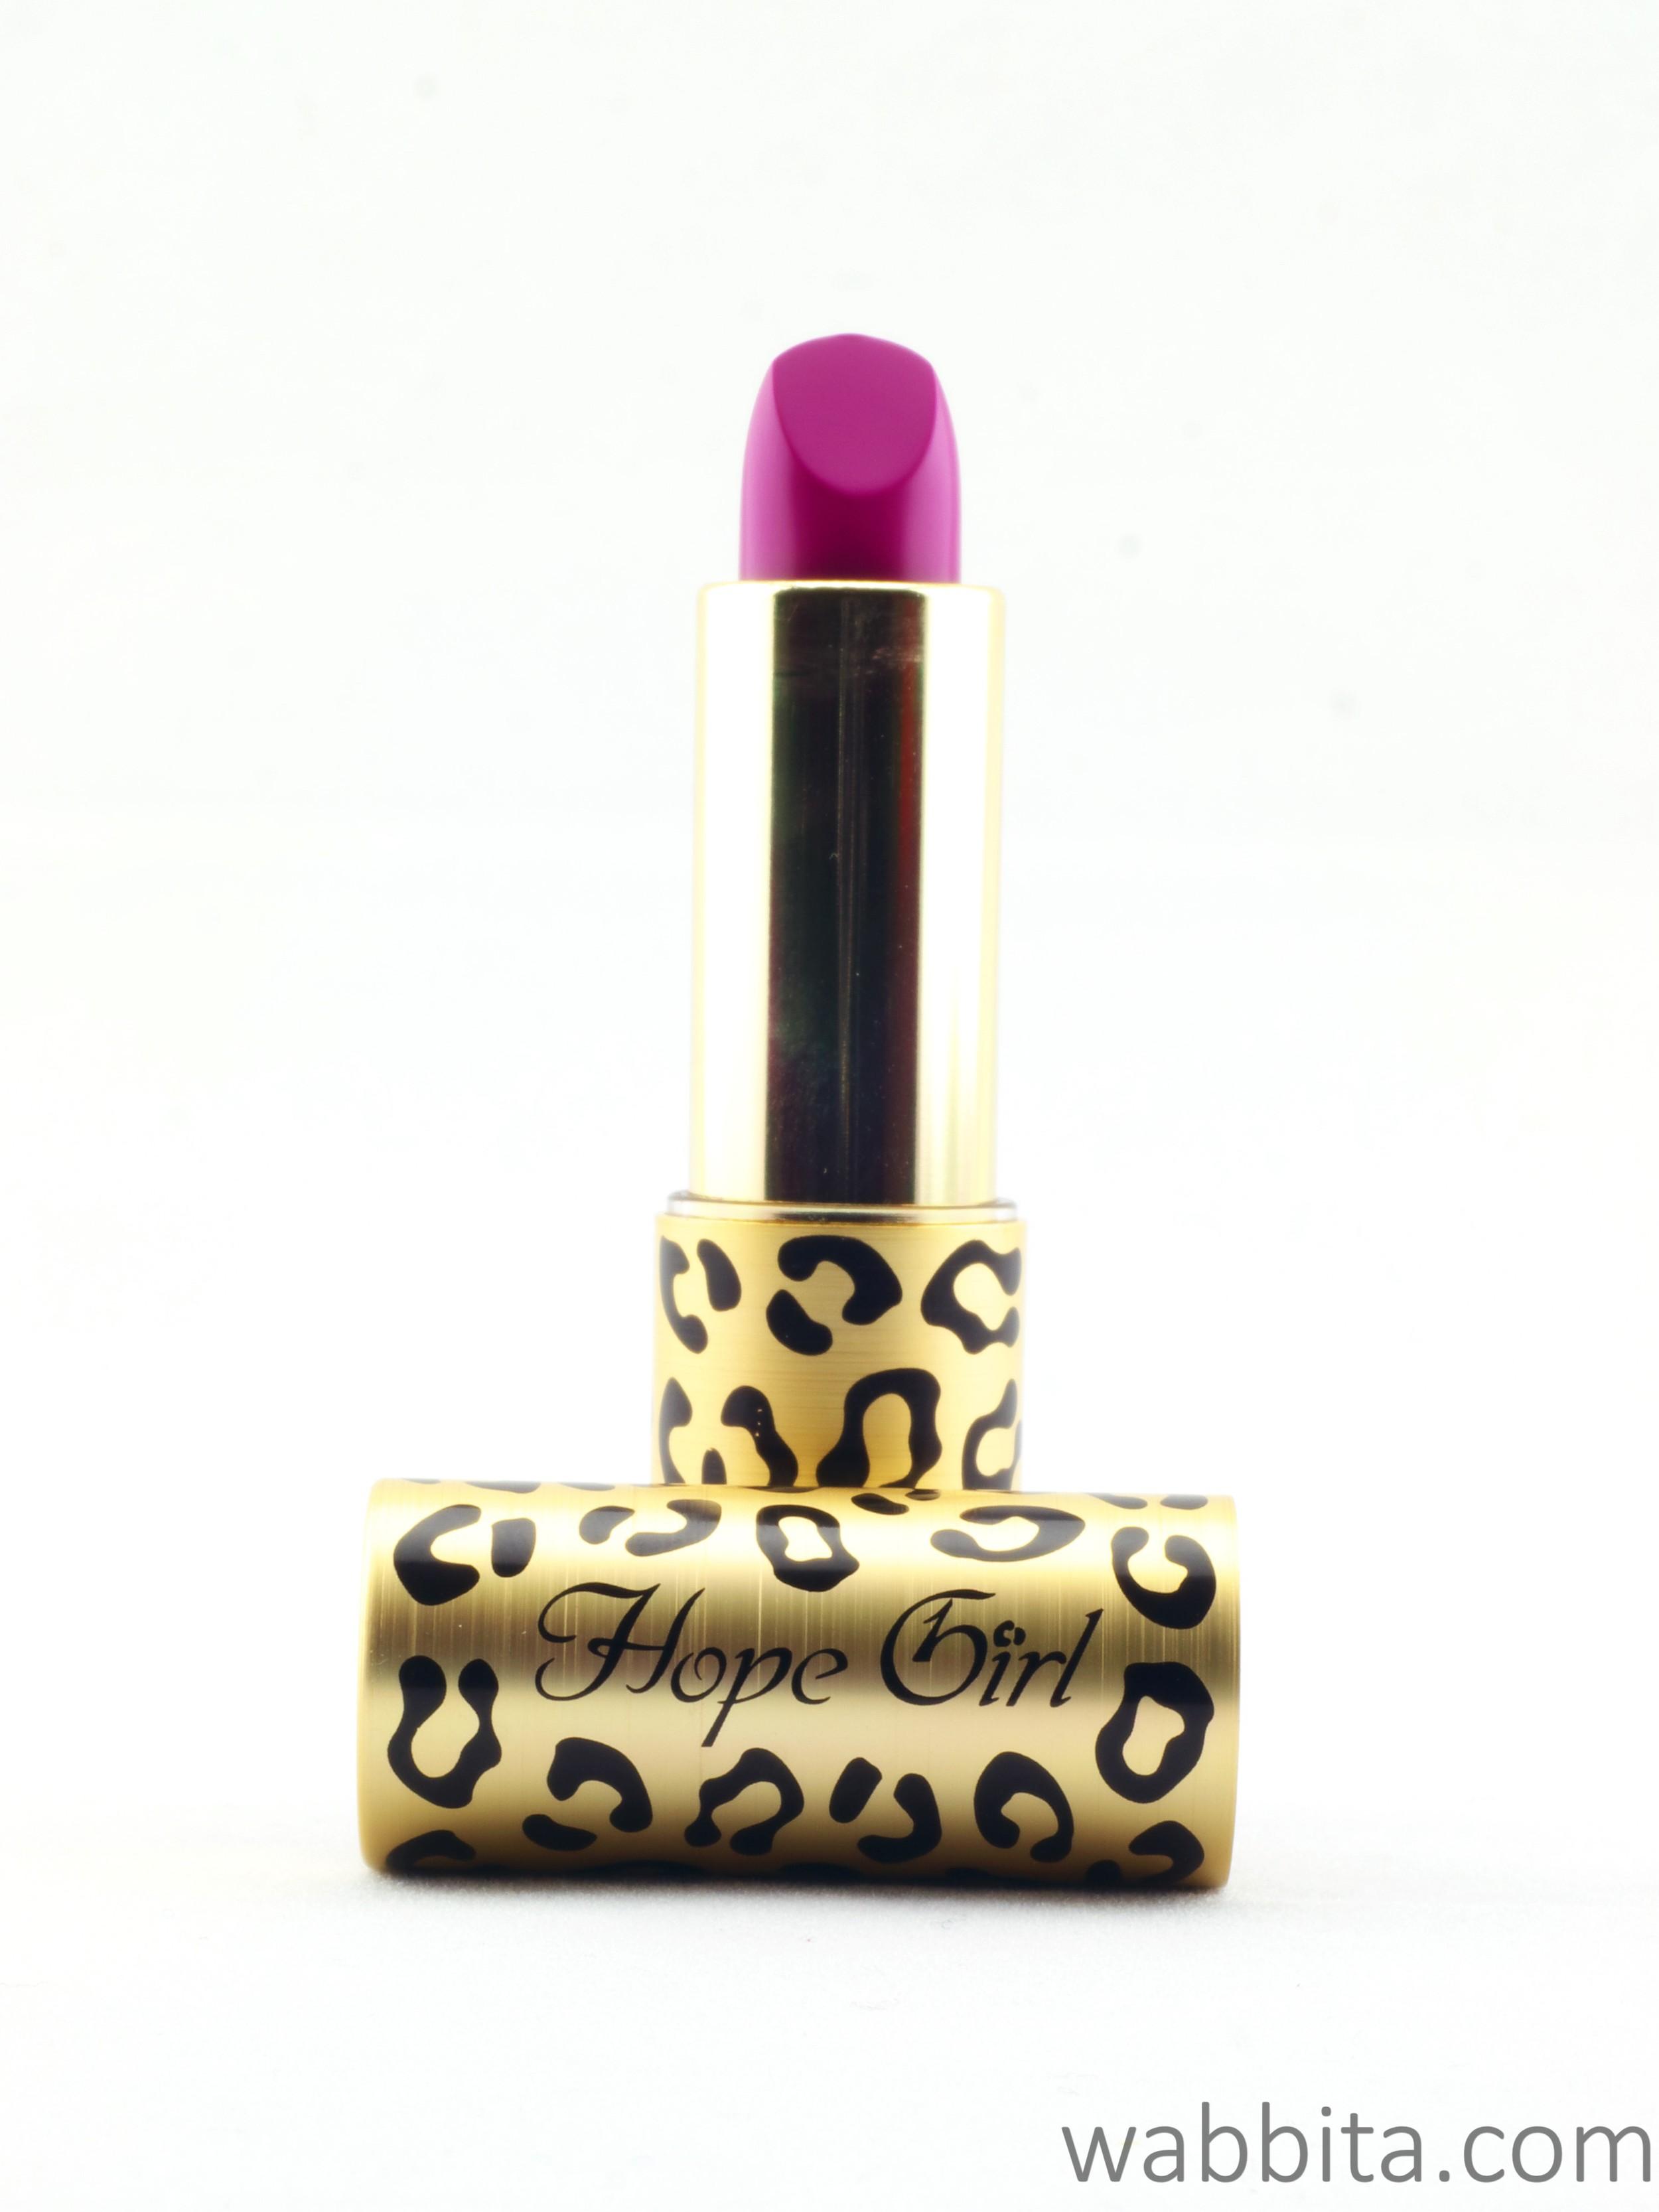 Beauty-Splurge-with-Lisa-Pullano4.jpg